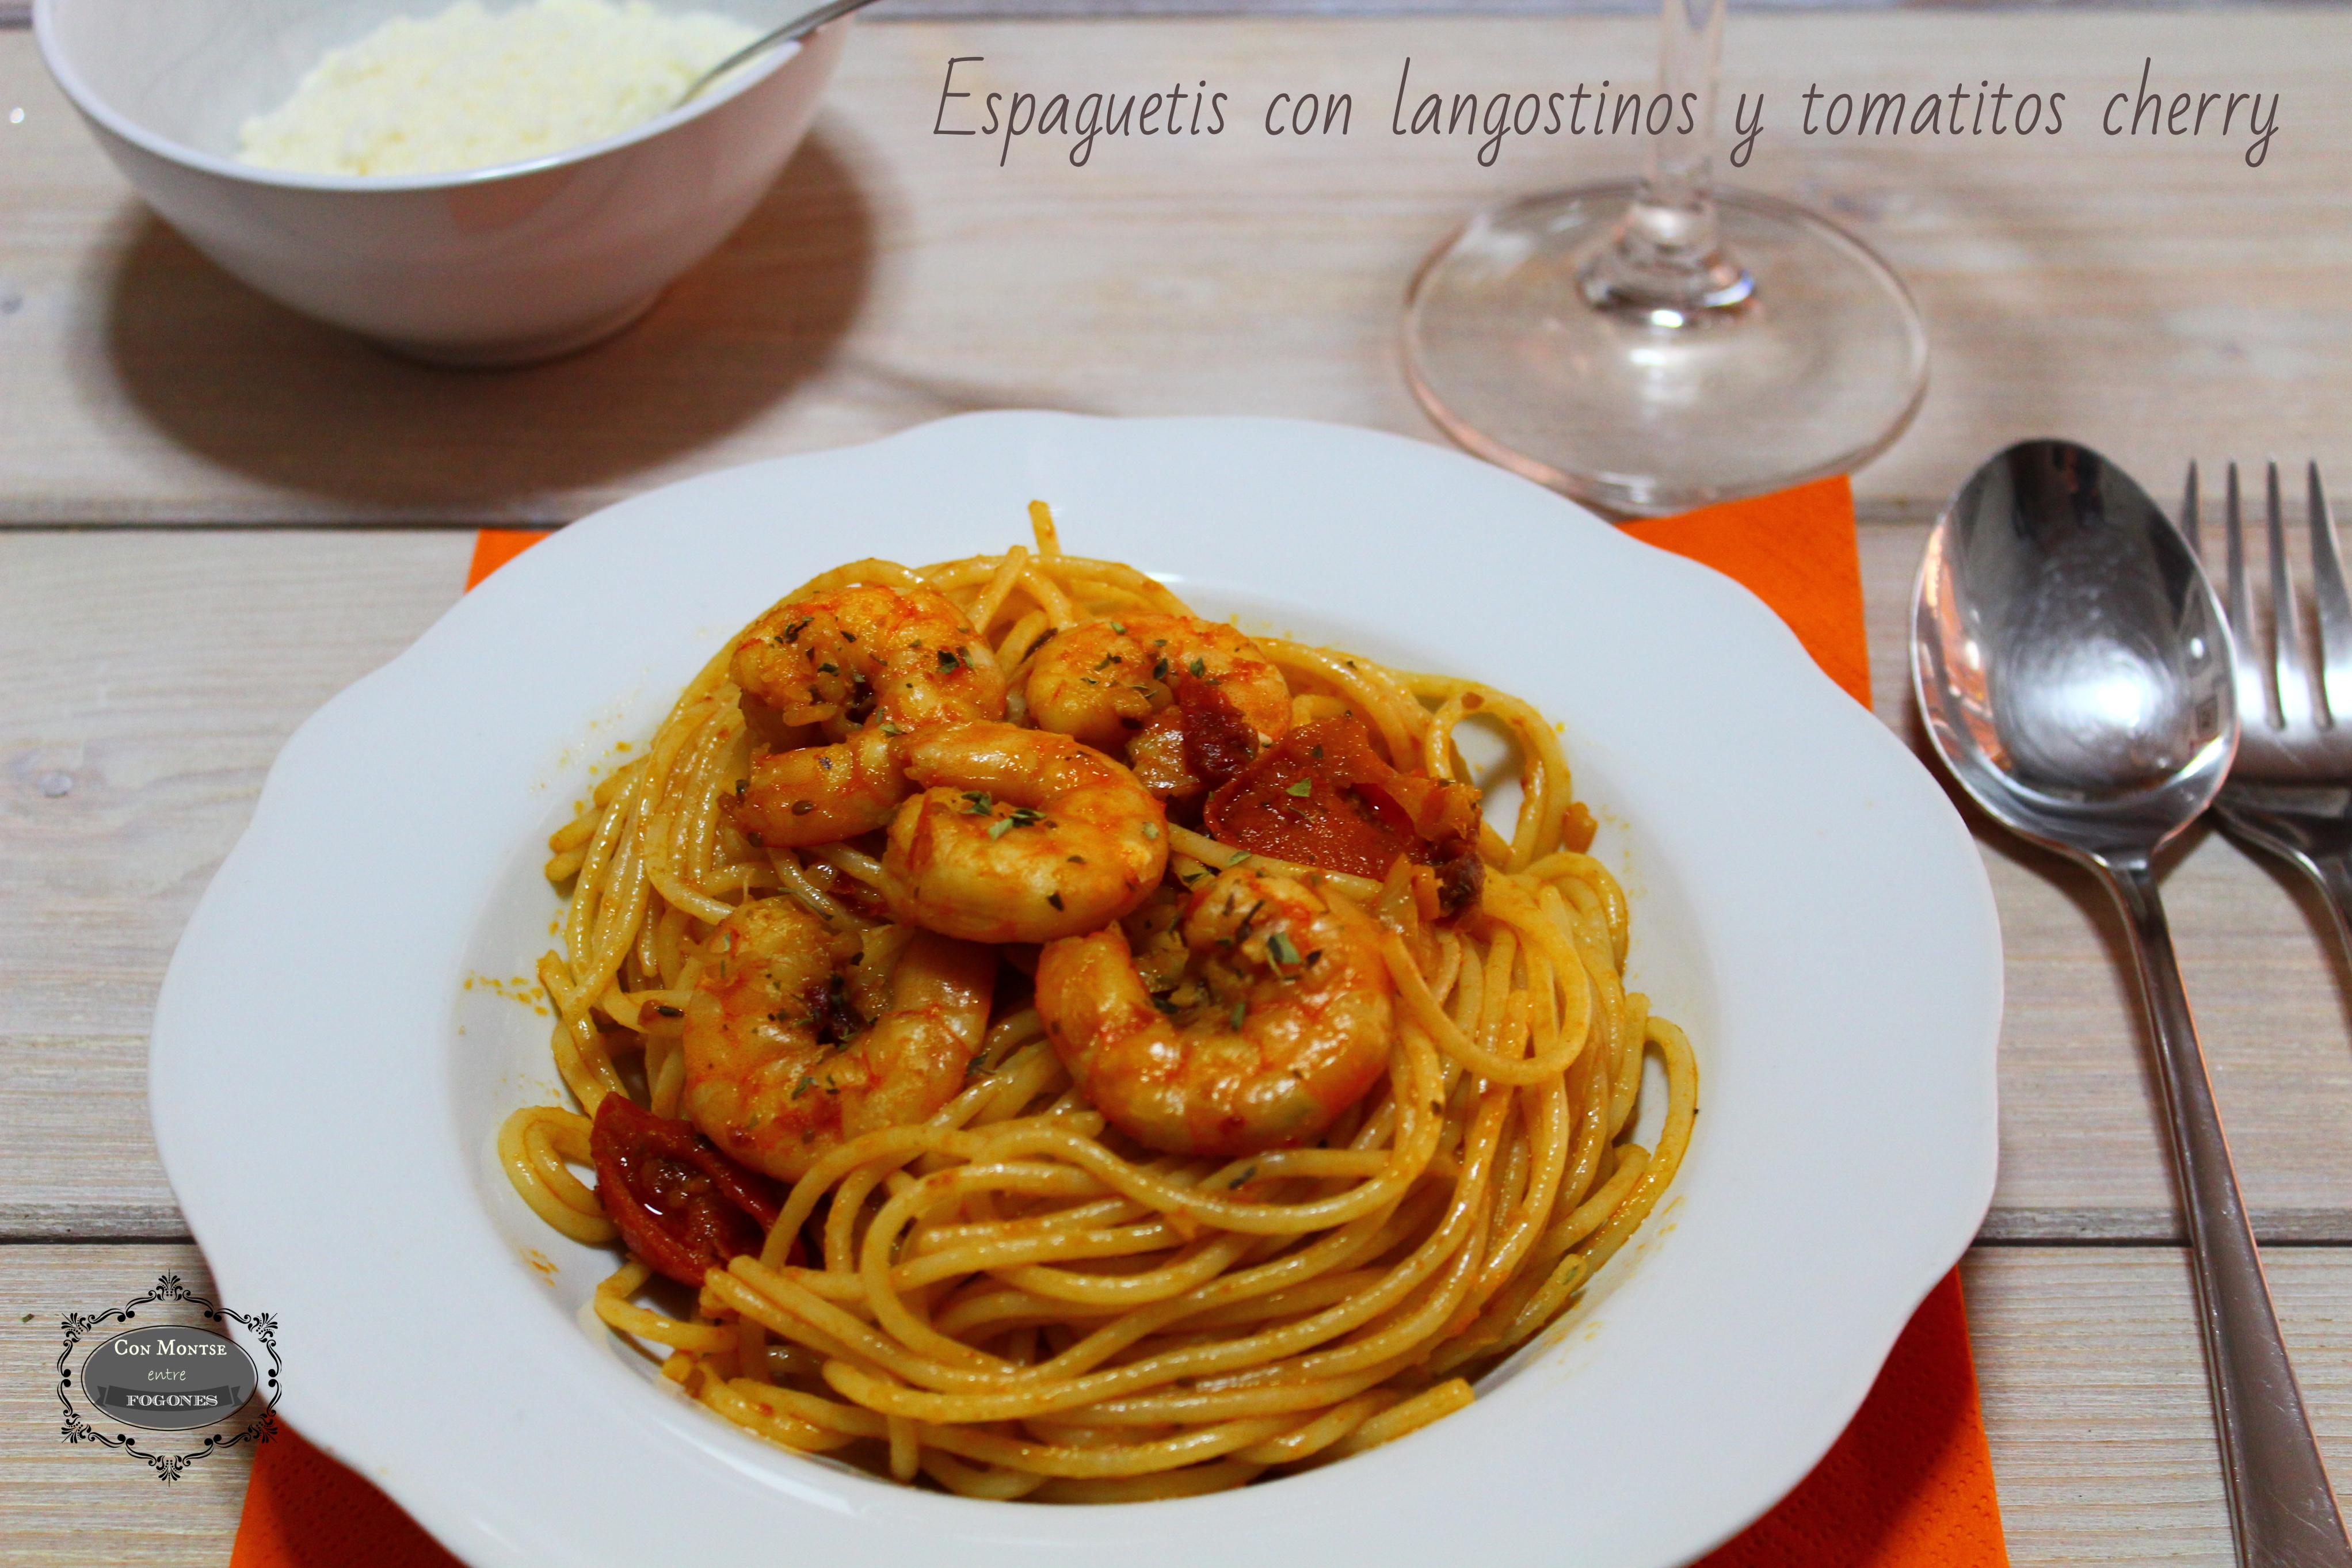 Espaguetis con langostino y tomatitos cherry III